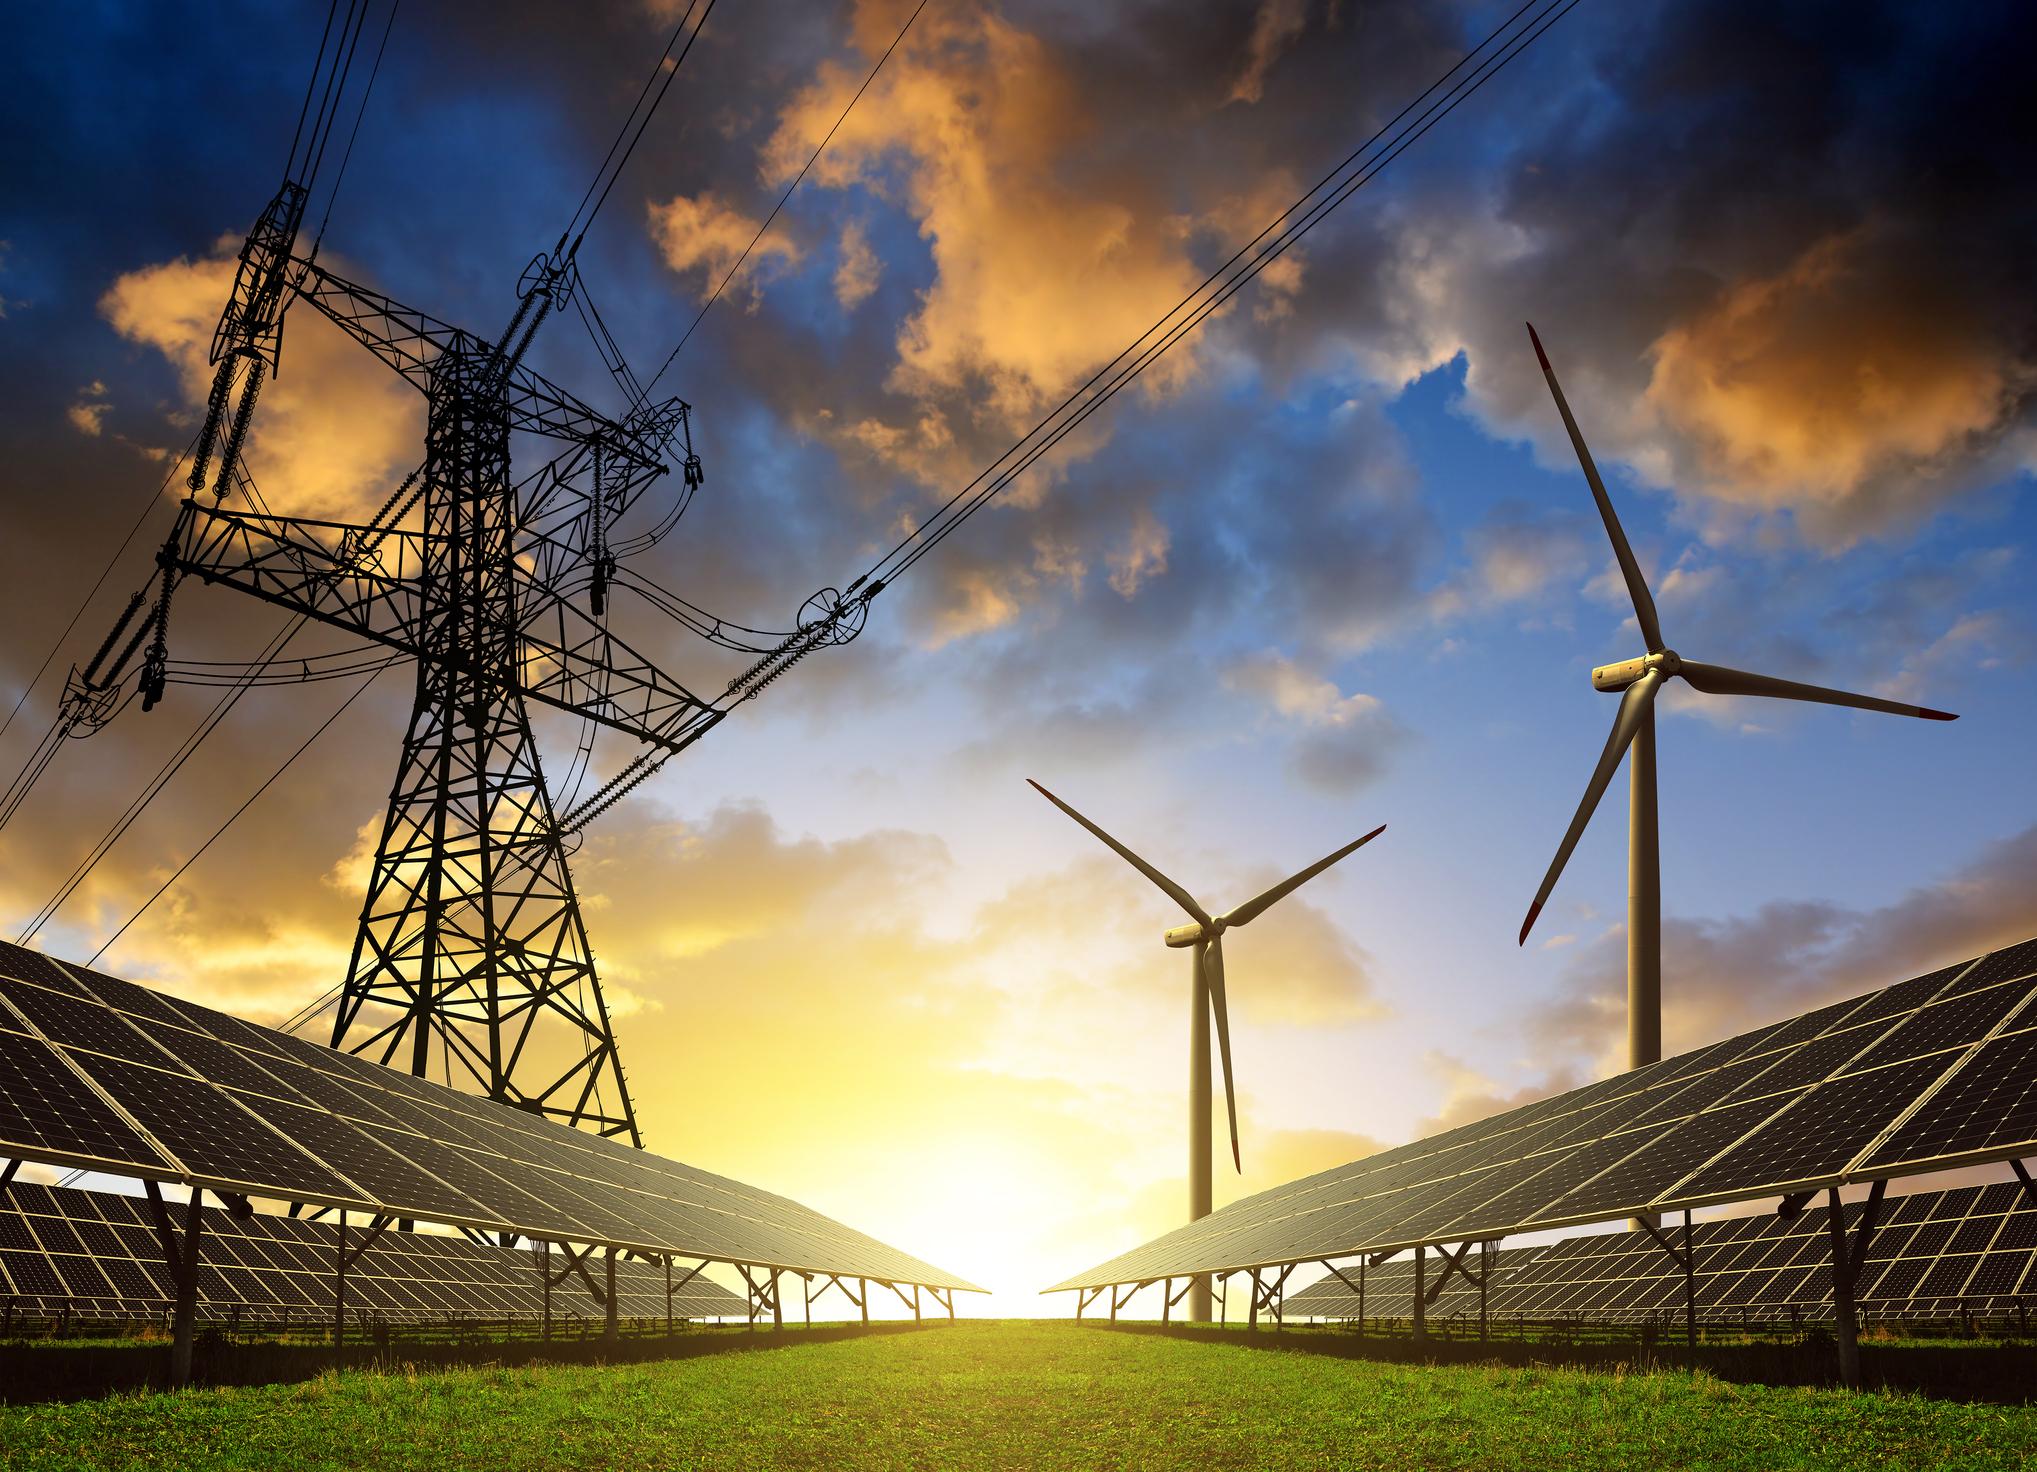 Best Energy Stocks 2020 3 Top Renewable Energy Stocks to Watch    The Motley Fool